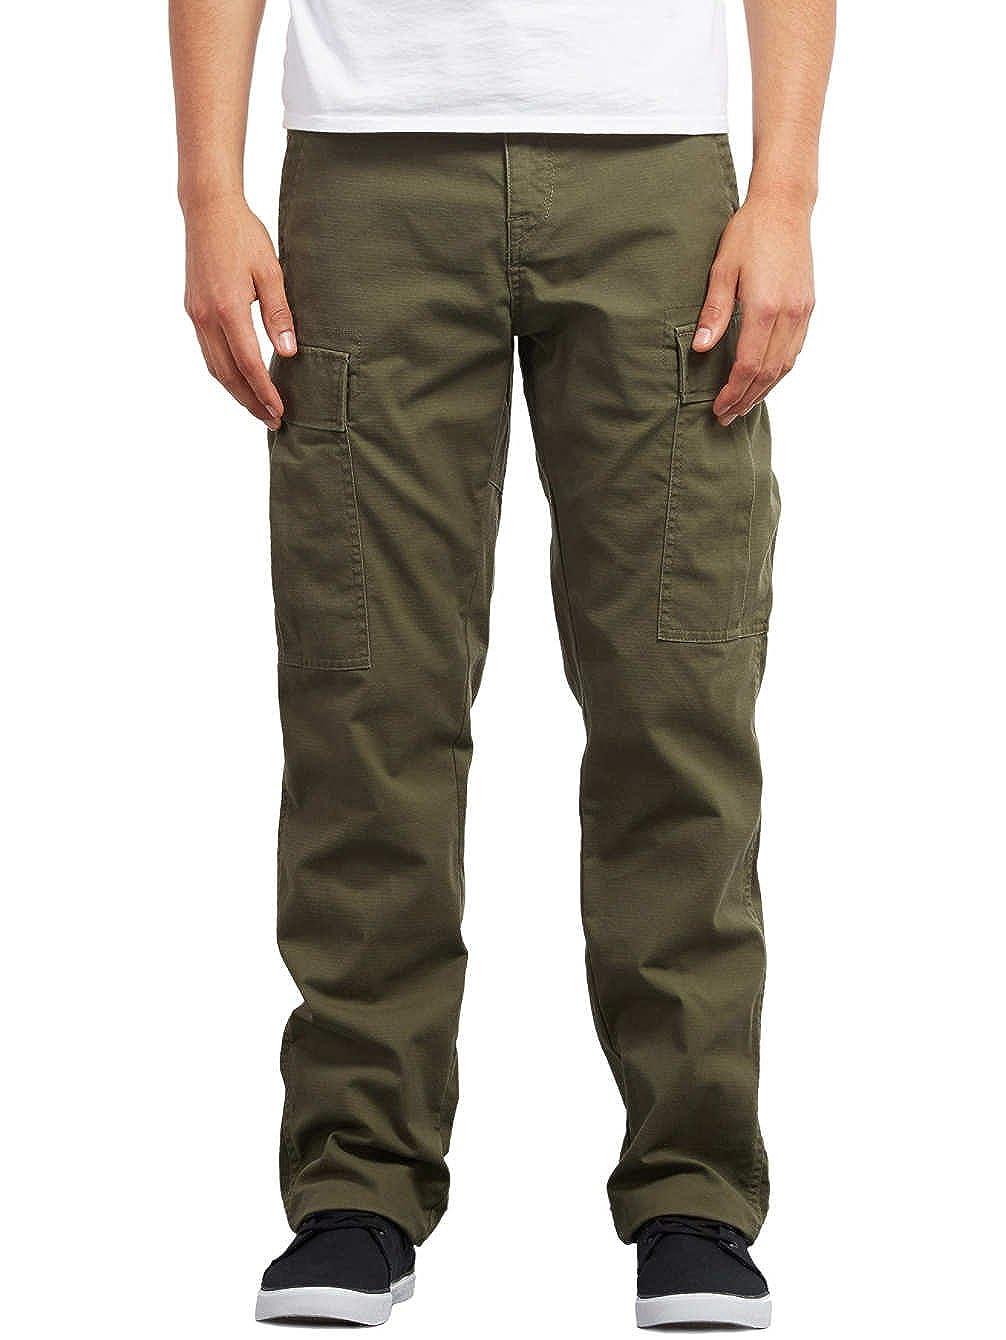 290a1bf73 Pants Men Volcom Strngr Reg Tap Cargo Pants  Amazon.co.uk  Clothing